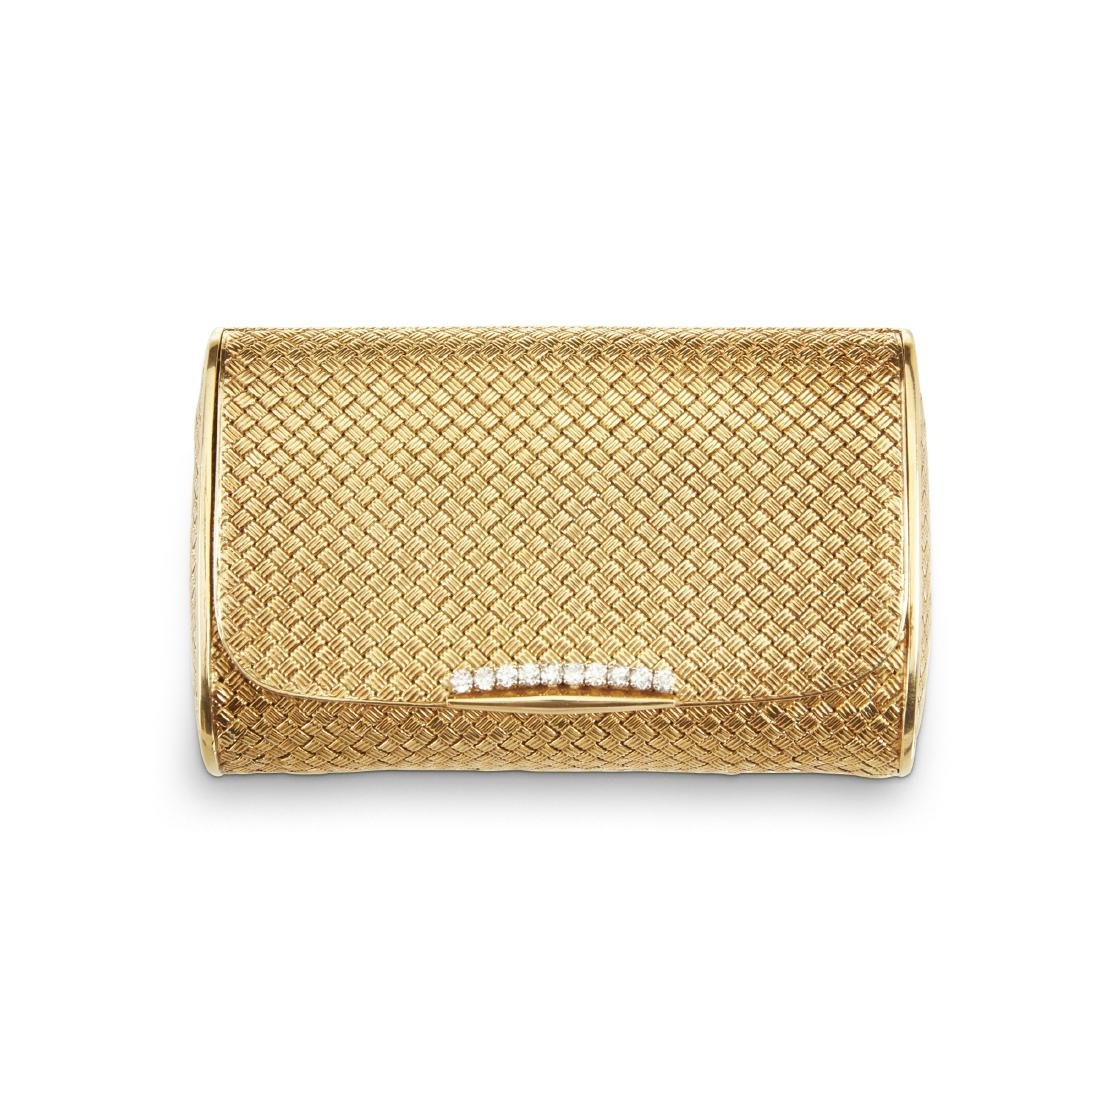 An Italian 18K Gold & Diamond Clutch